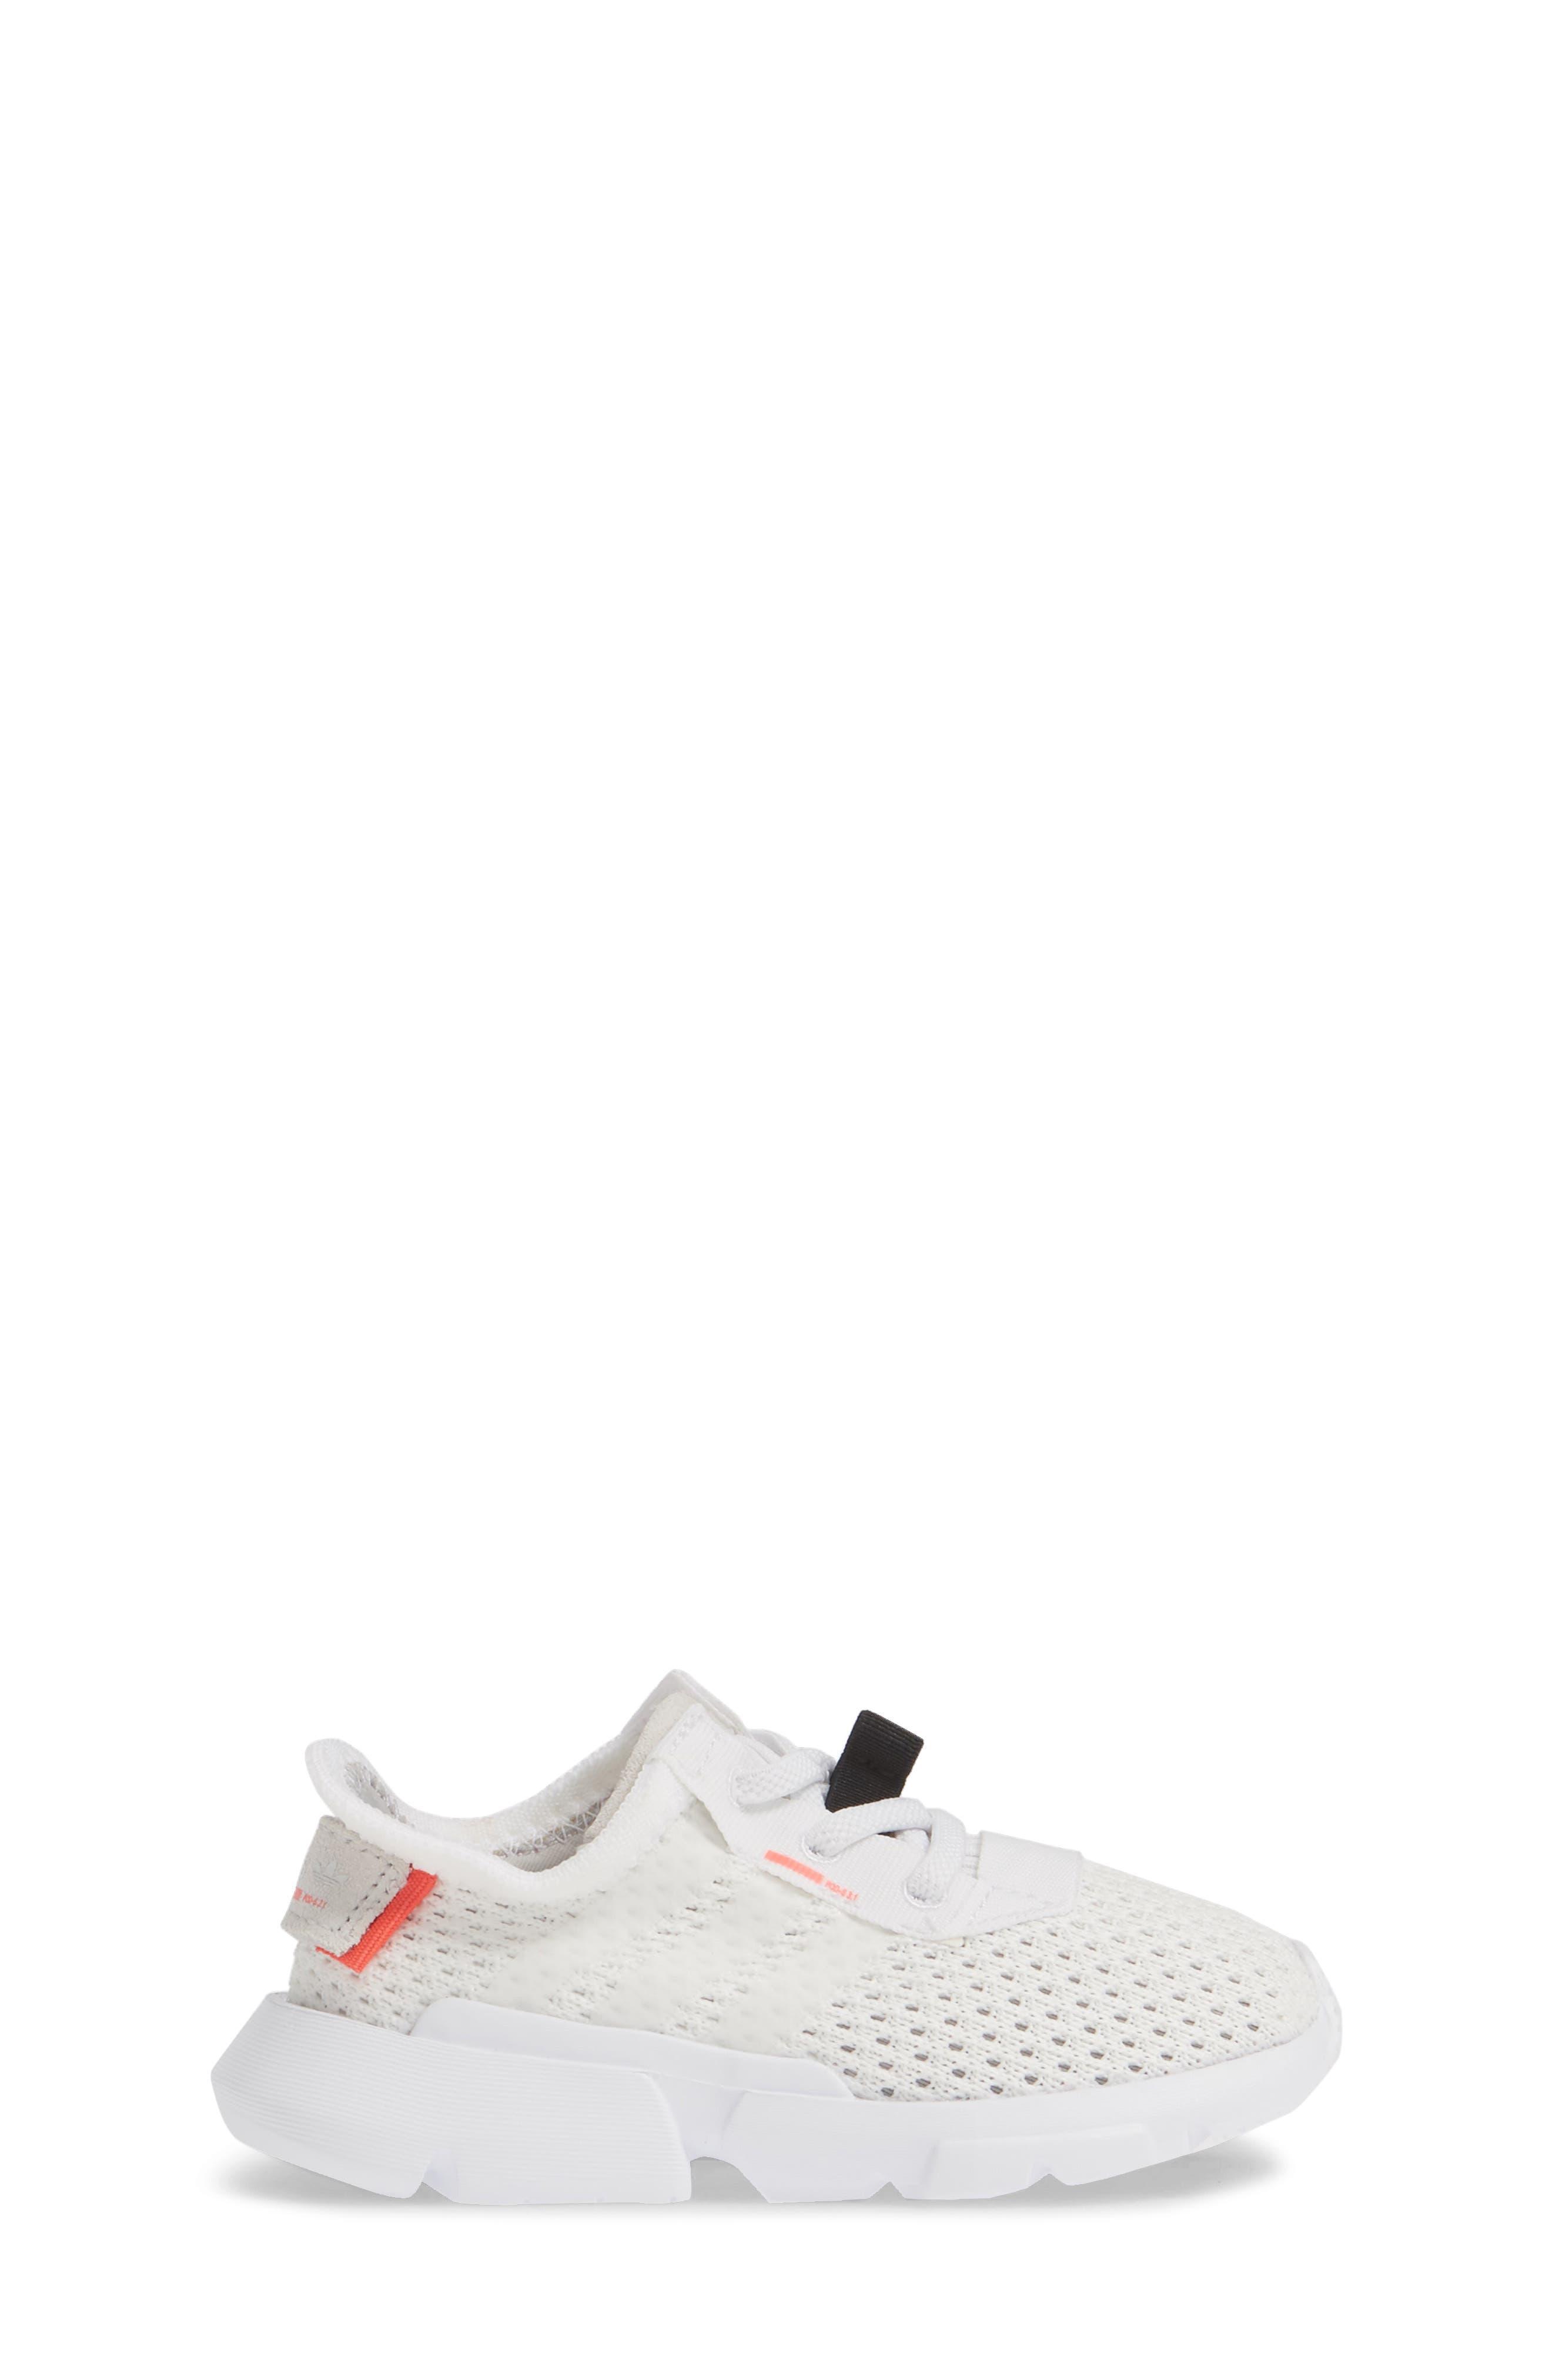 ADIDAS, POD-S3.1 Sneaker, Alternate thumbnail 3, color, WHITE/ WHITE/ SHOCK RED